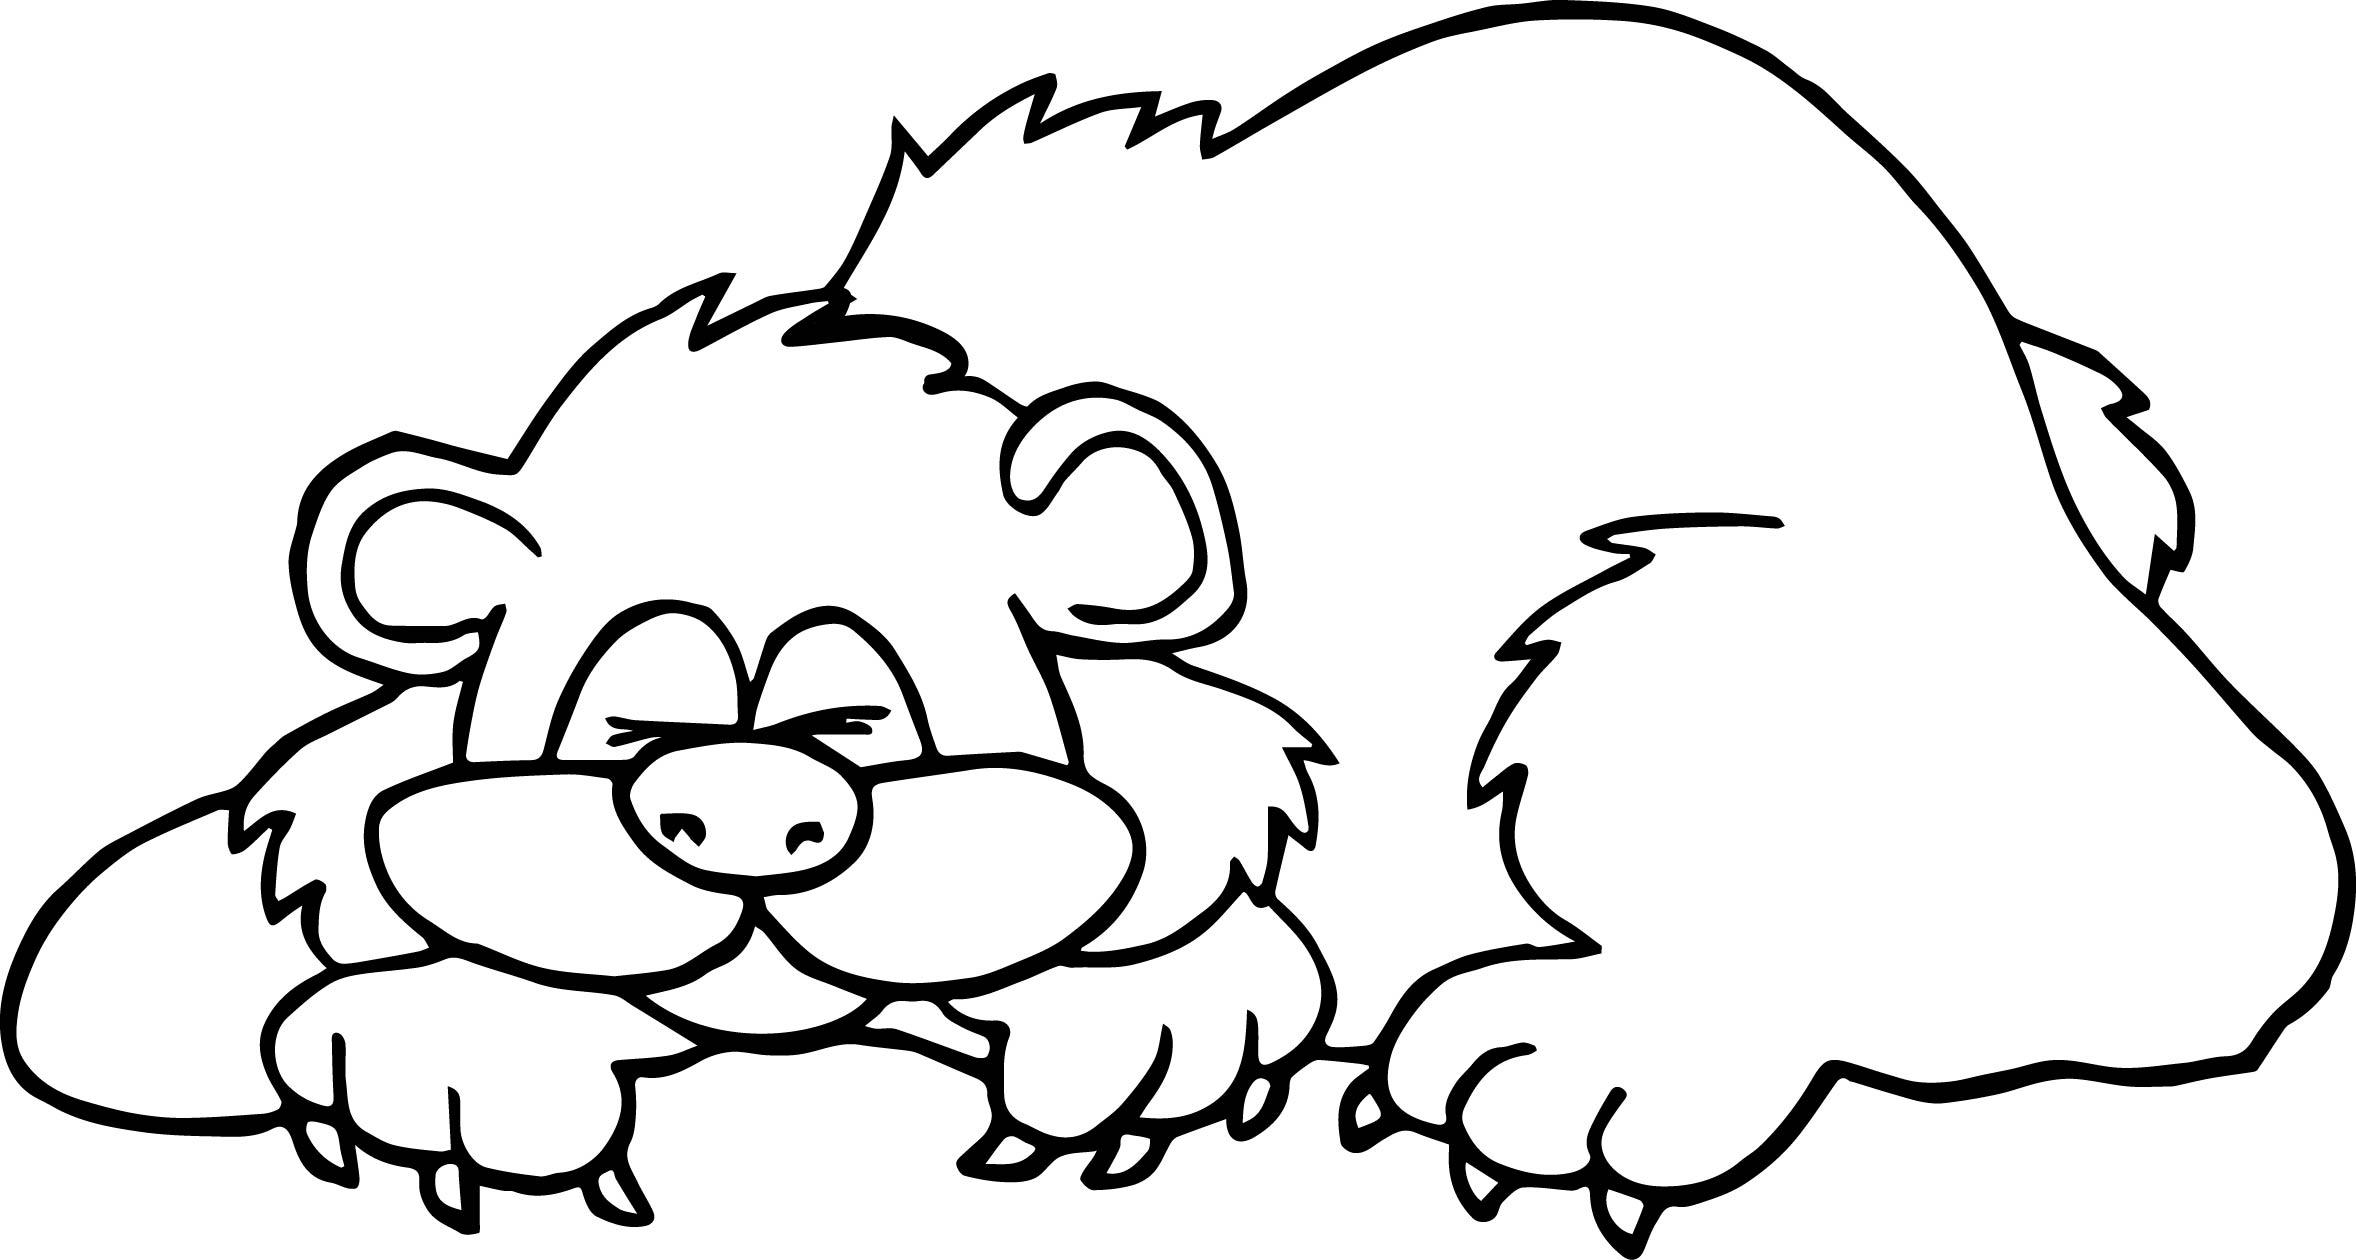 Yogi Bear Coloring Page Interesting Design Ideas Free Coloring Pages Bears Yogi Bear Google